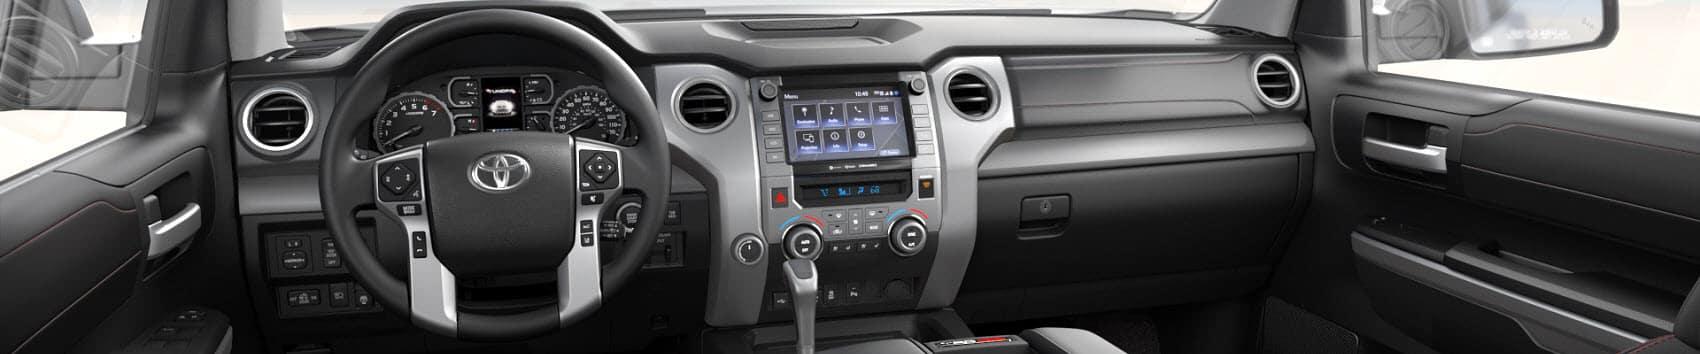 2020 Toyota Tundra Interior Technology